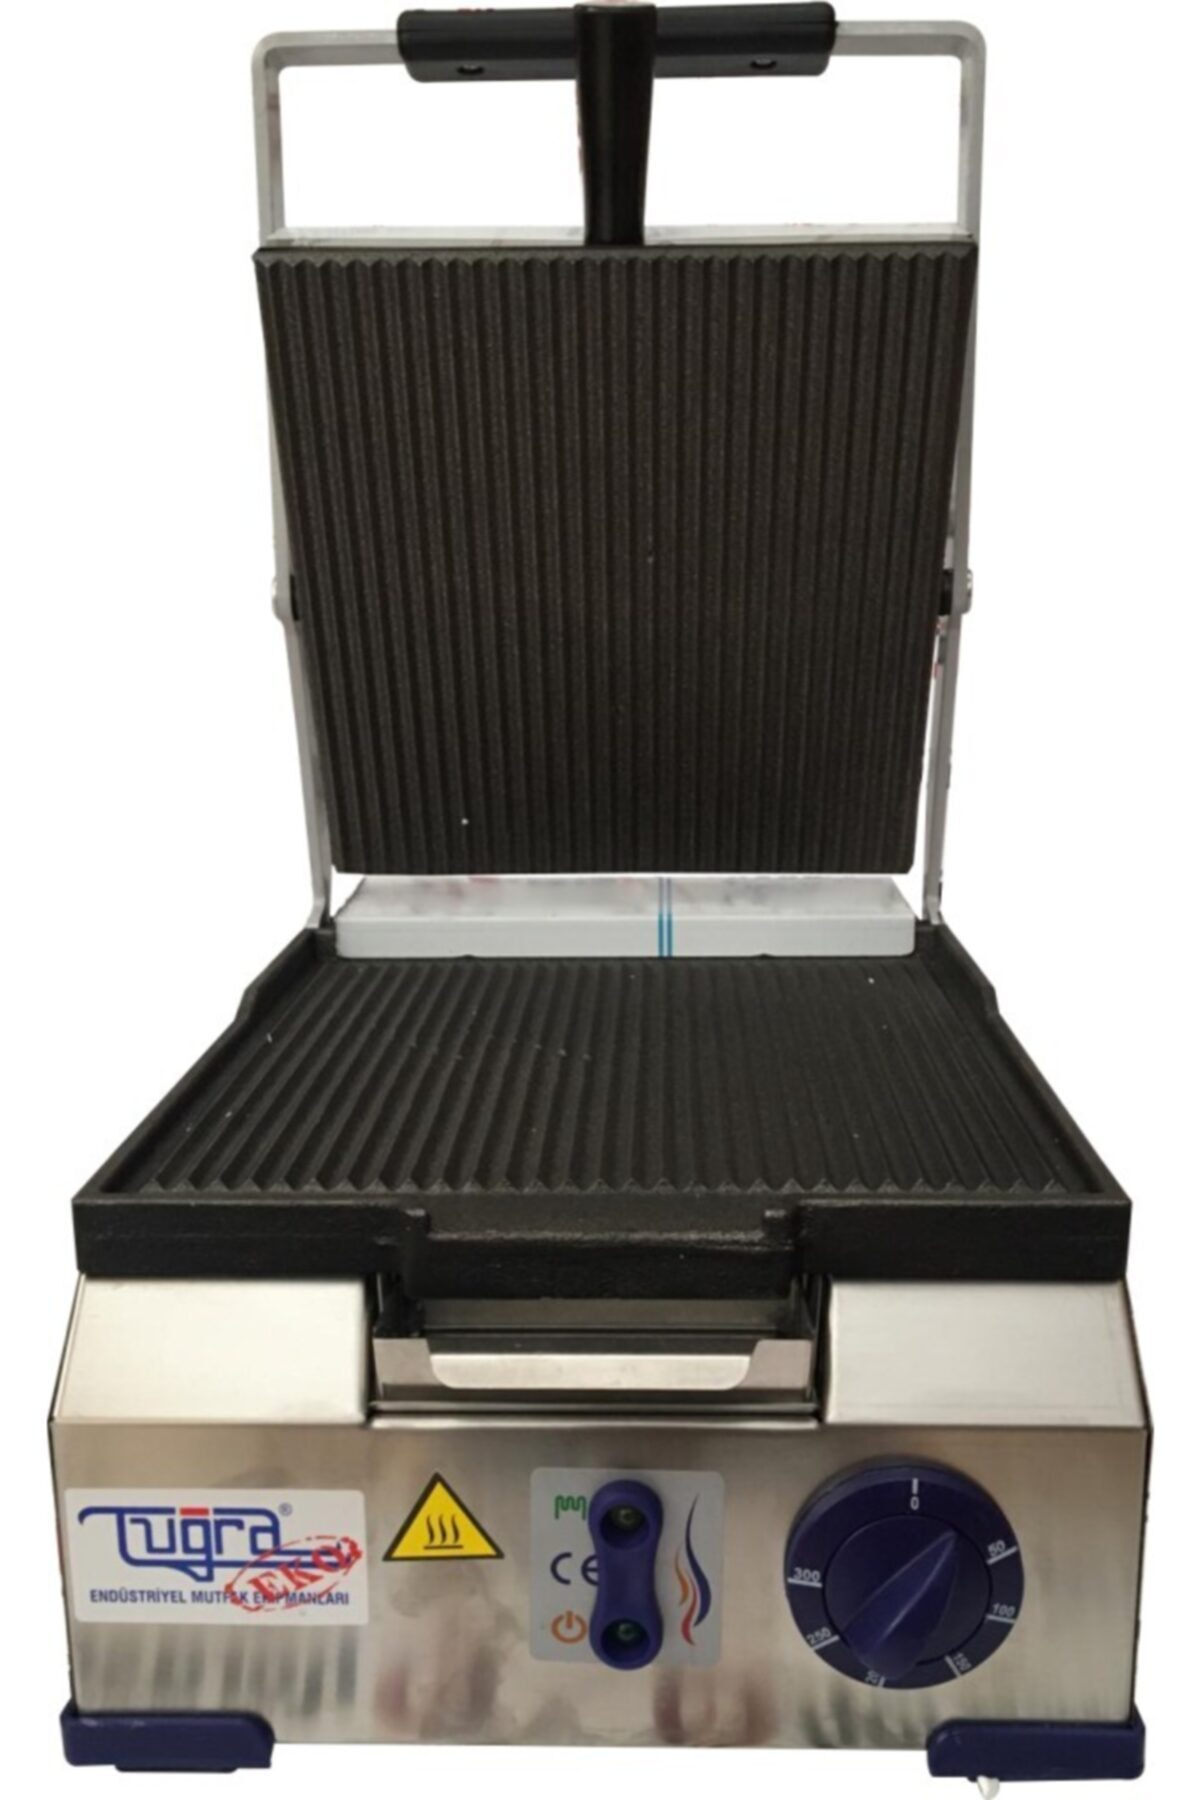 Tuğra 8 Dilim Elektirkli Tost Makinası 2